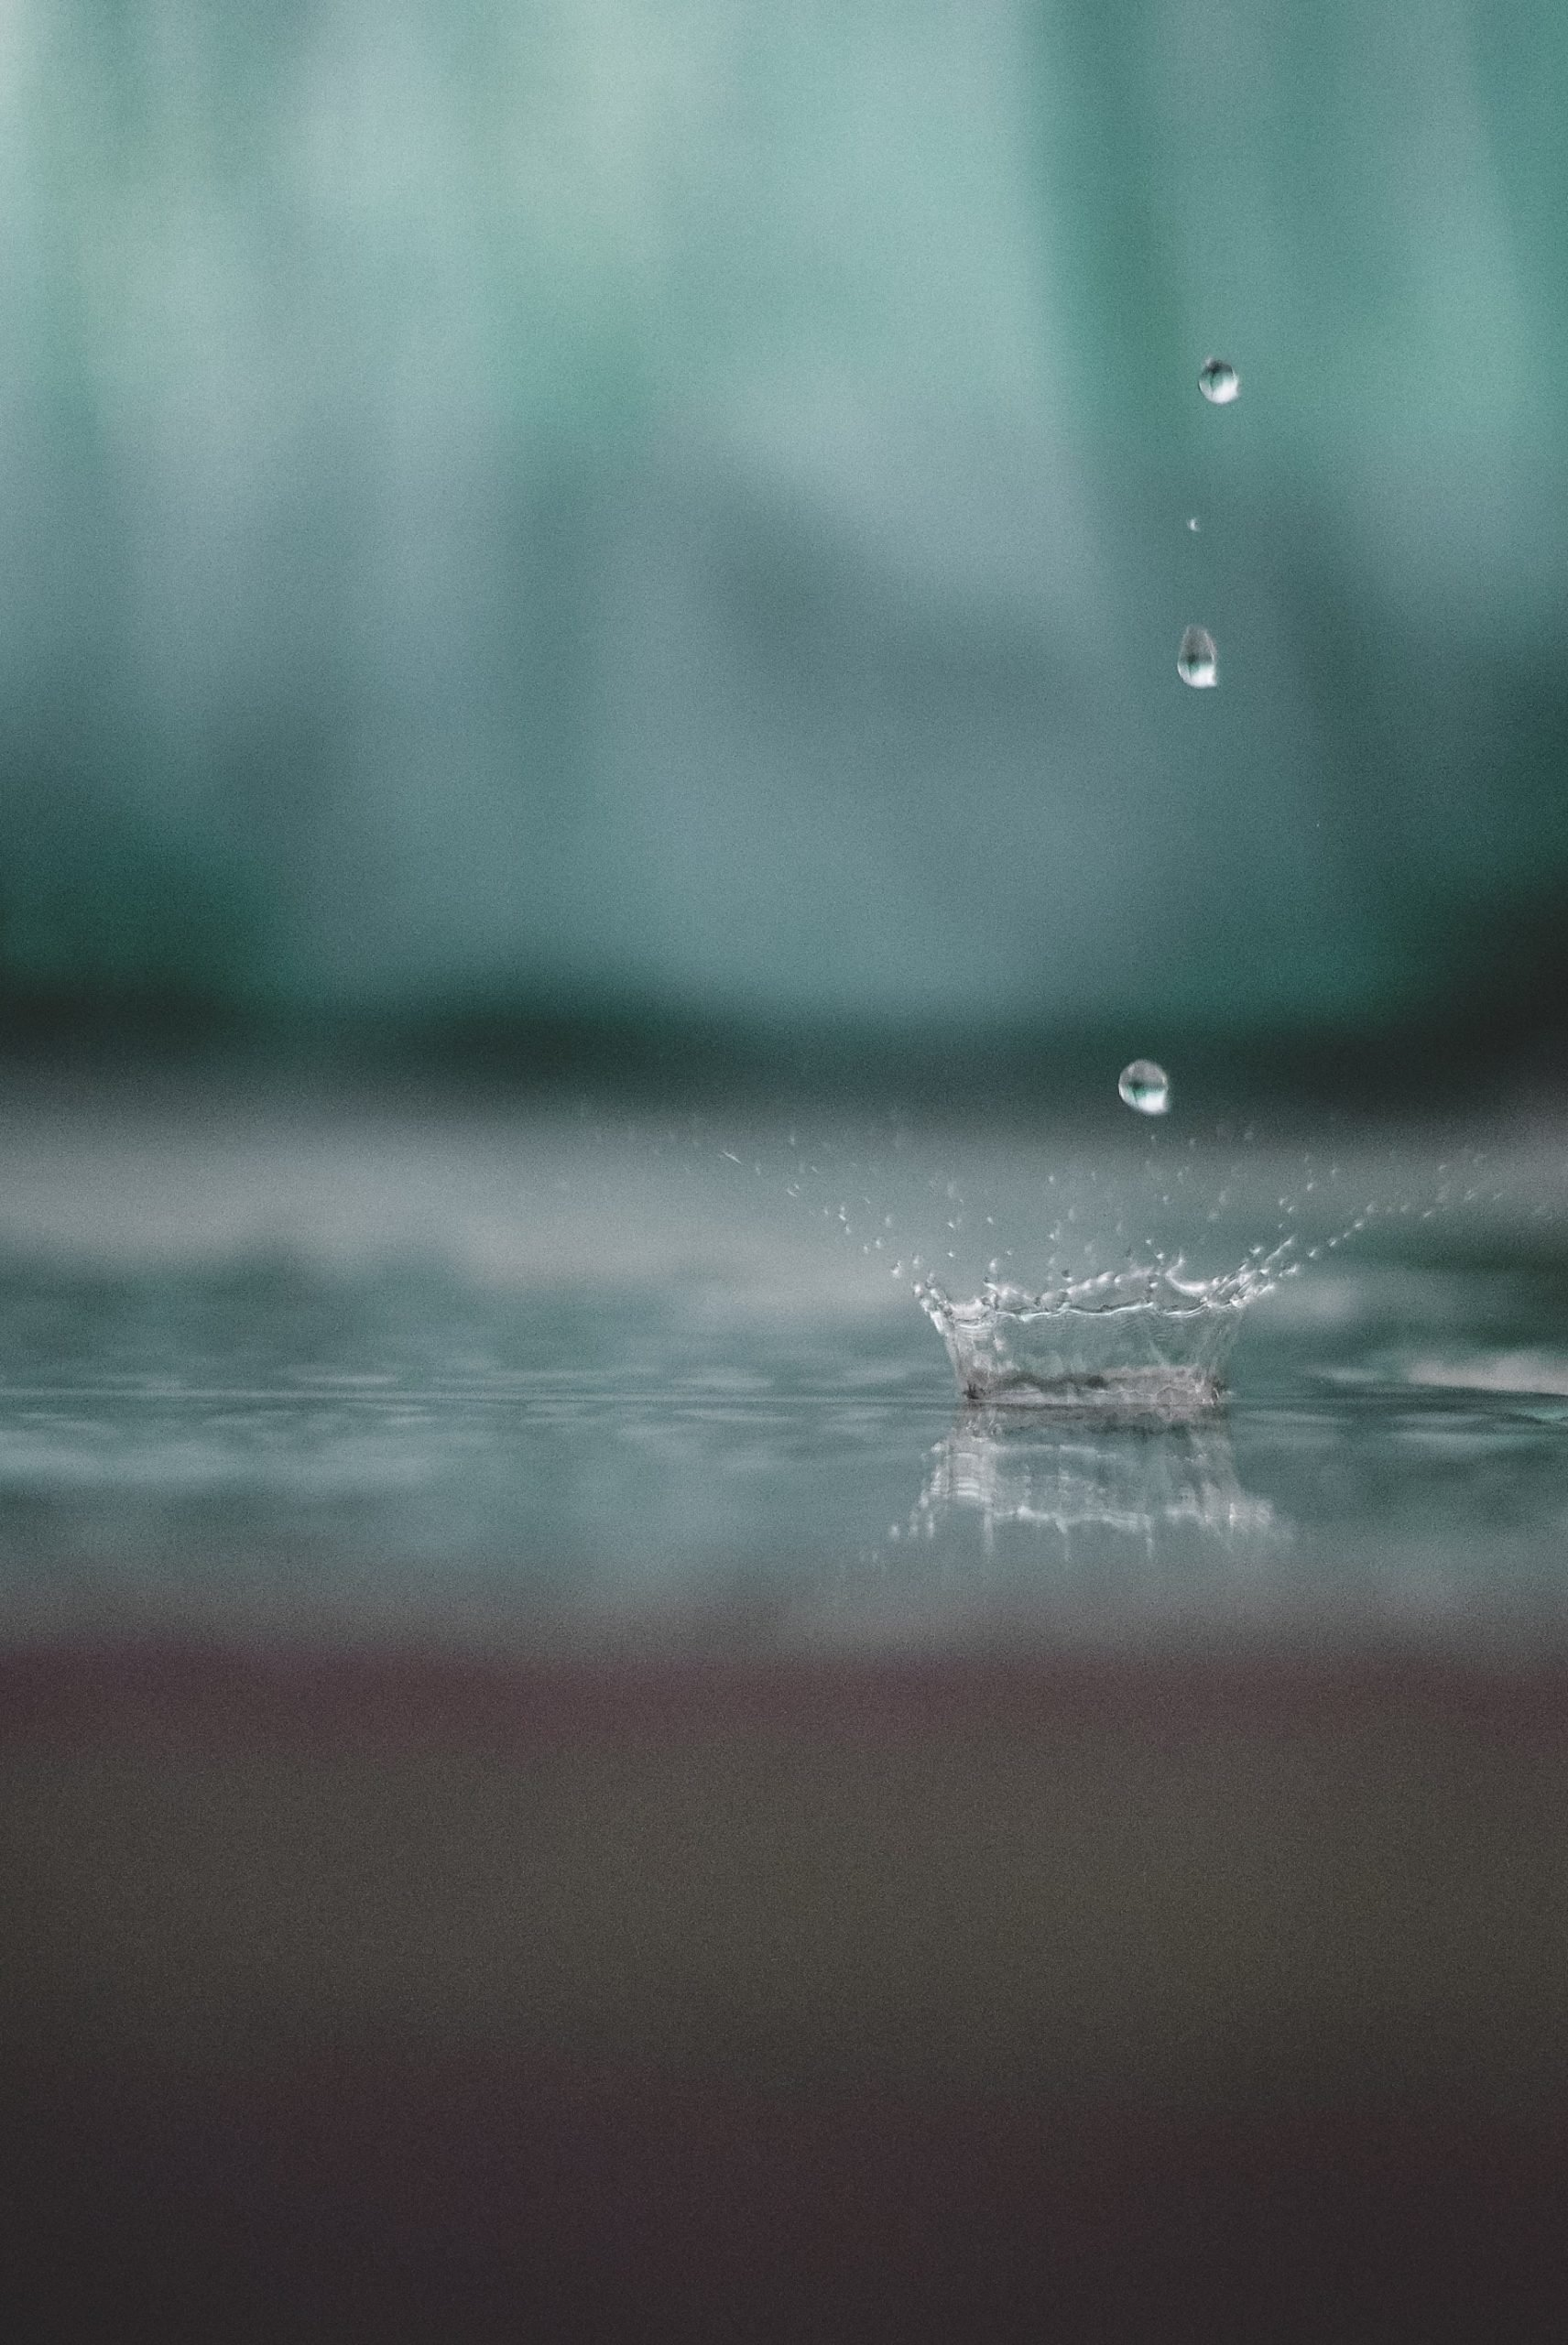 A Single Drop of Water